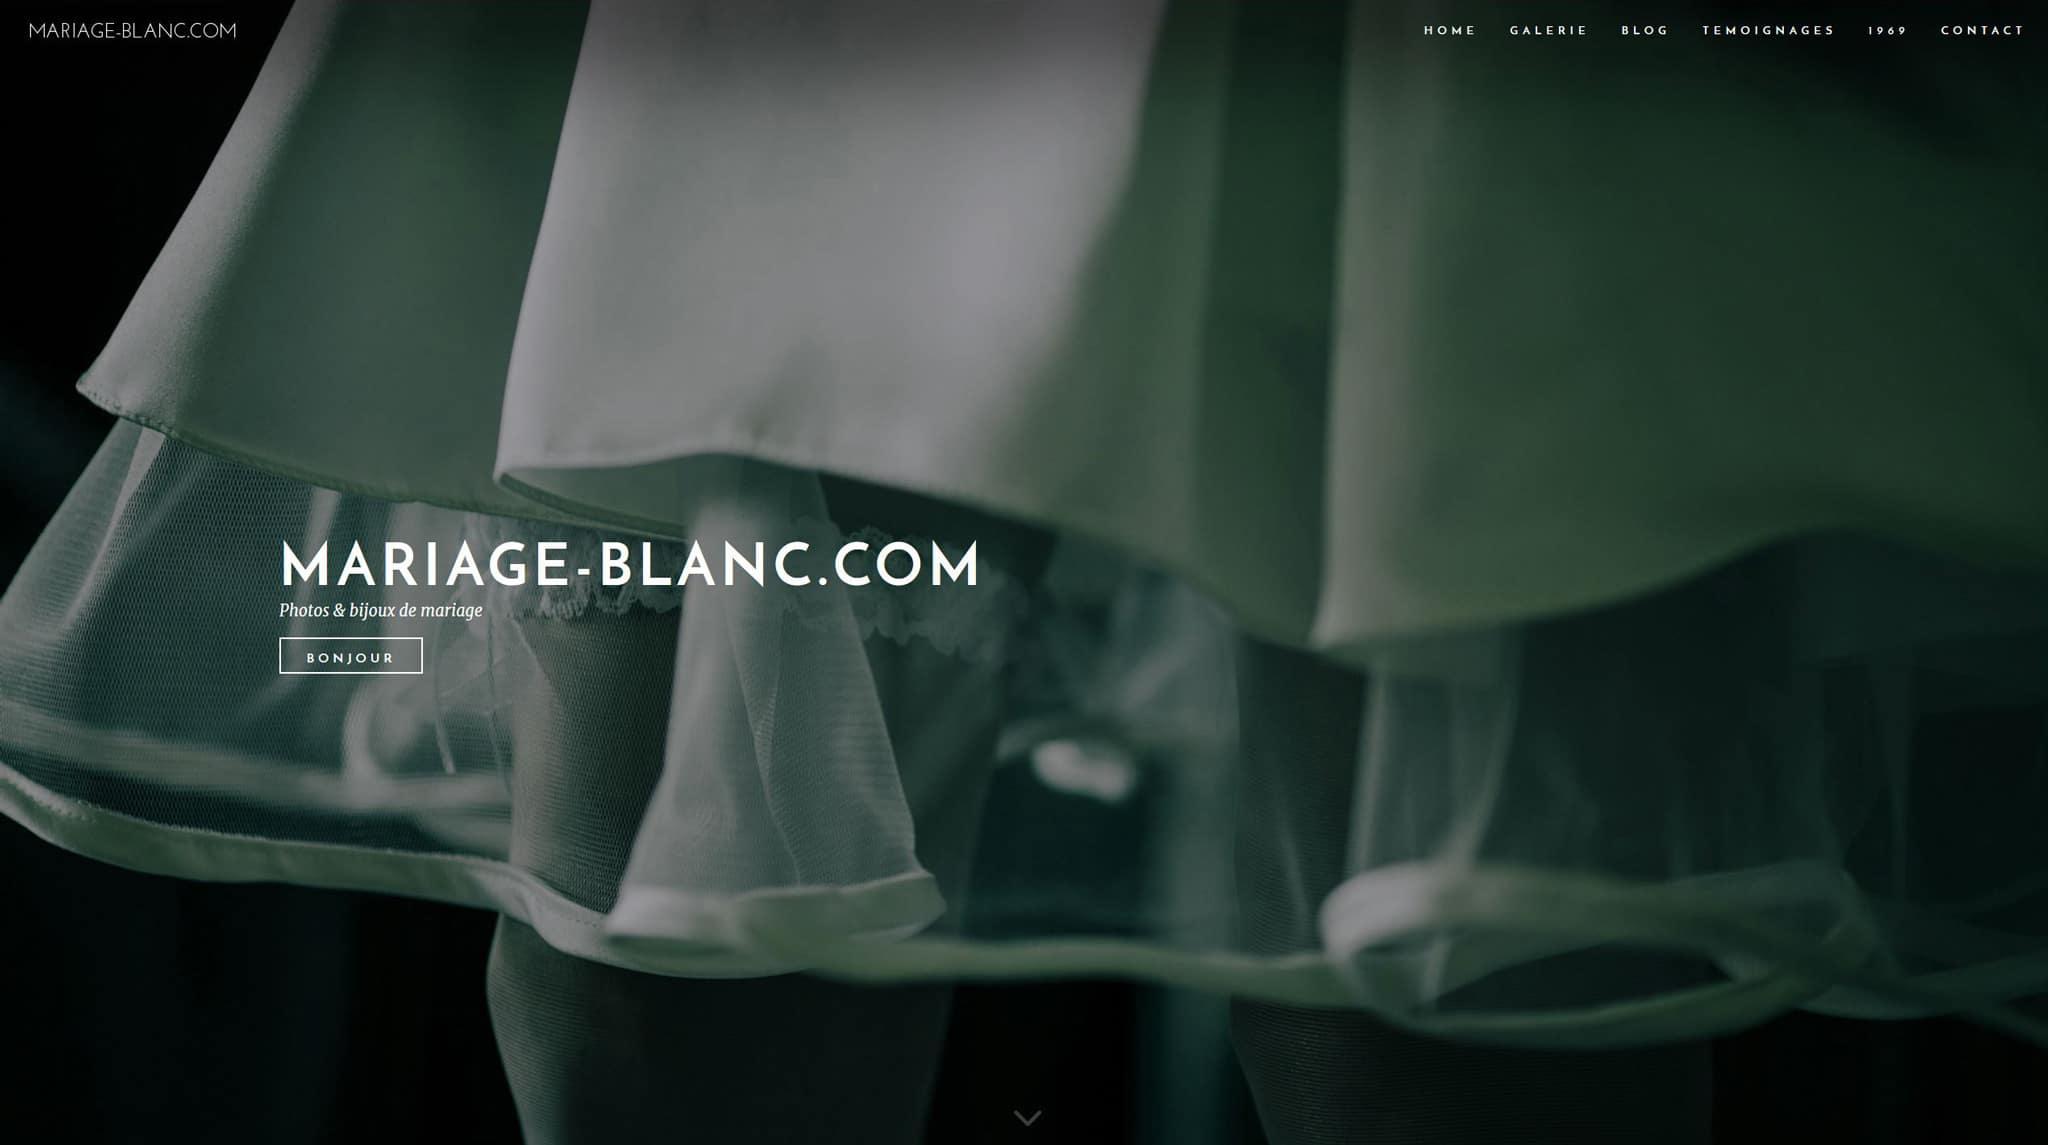 mariage-blanc.com